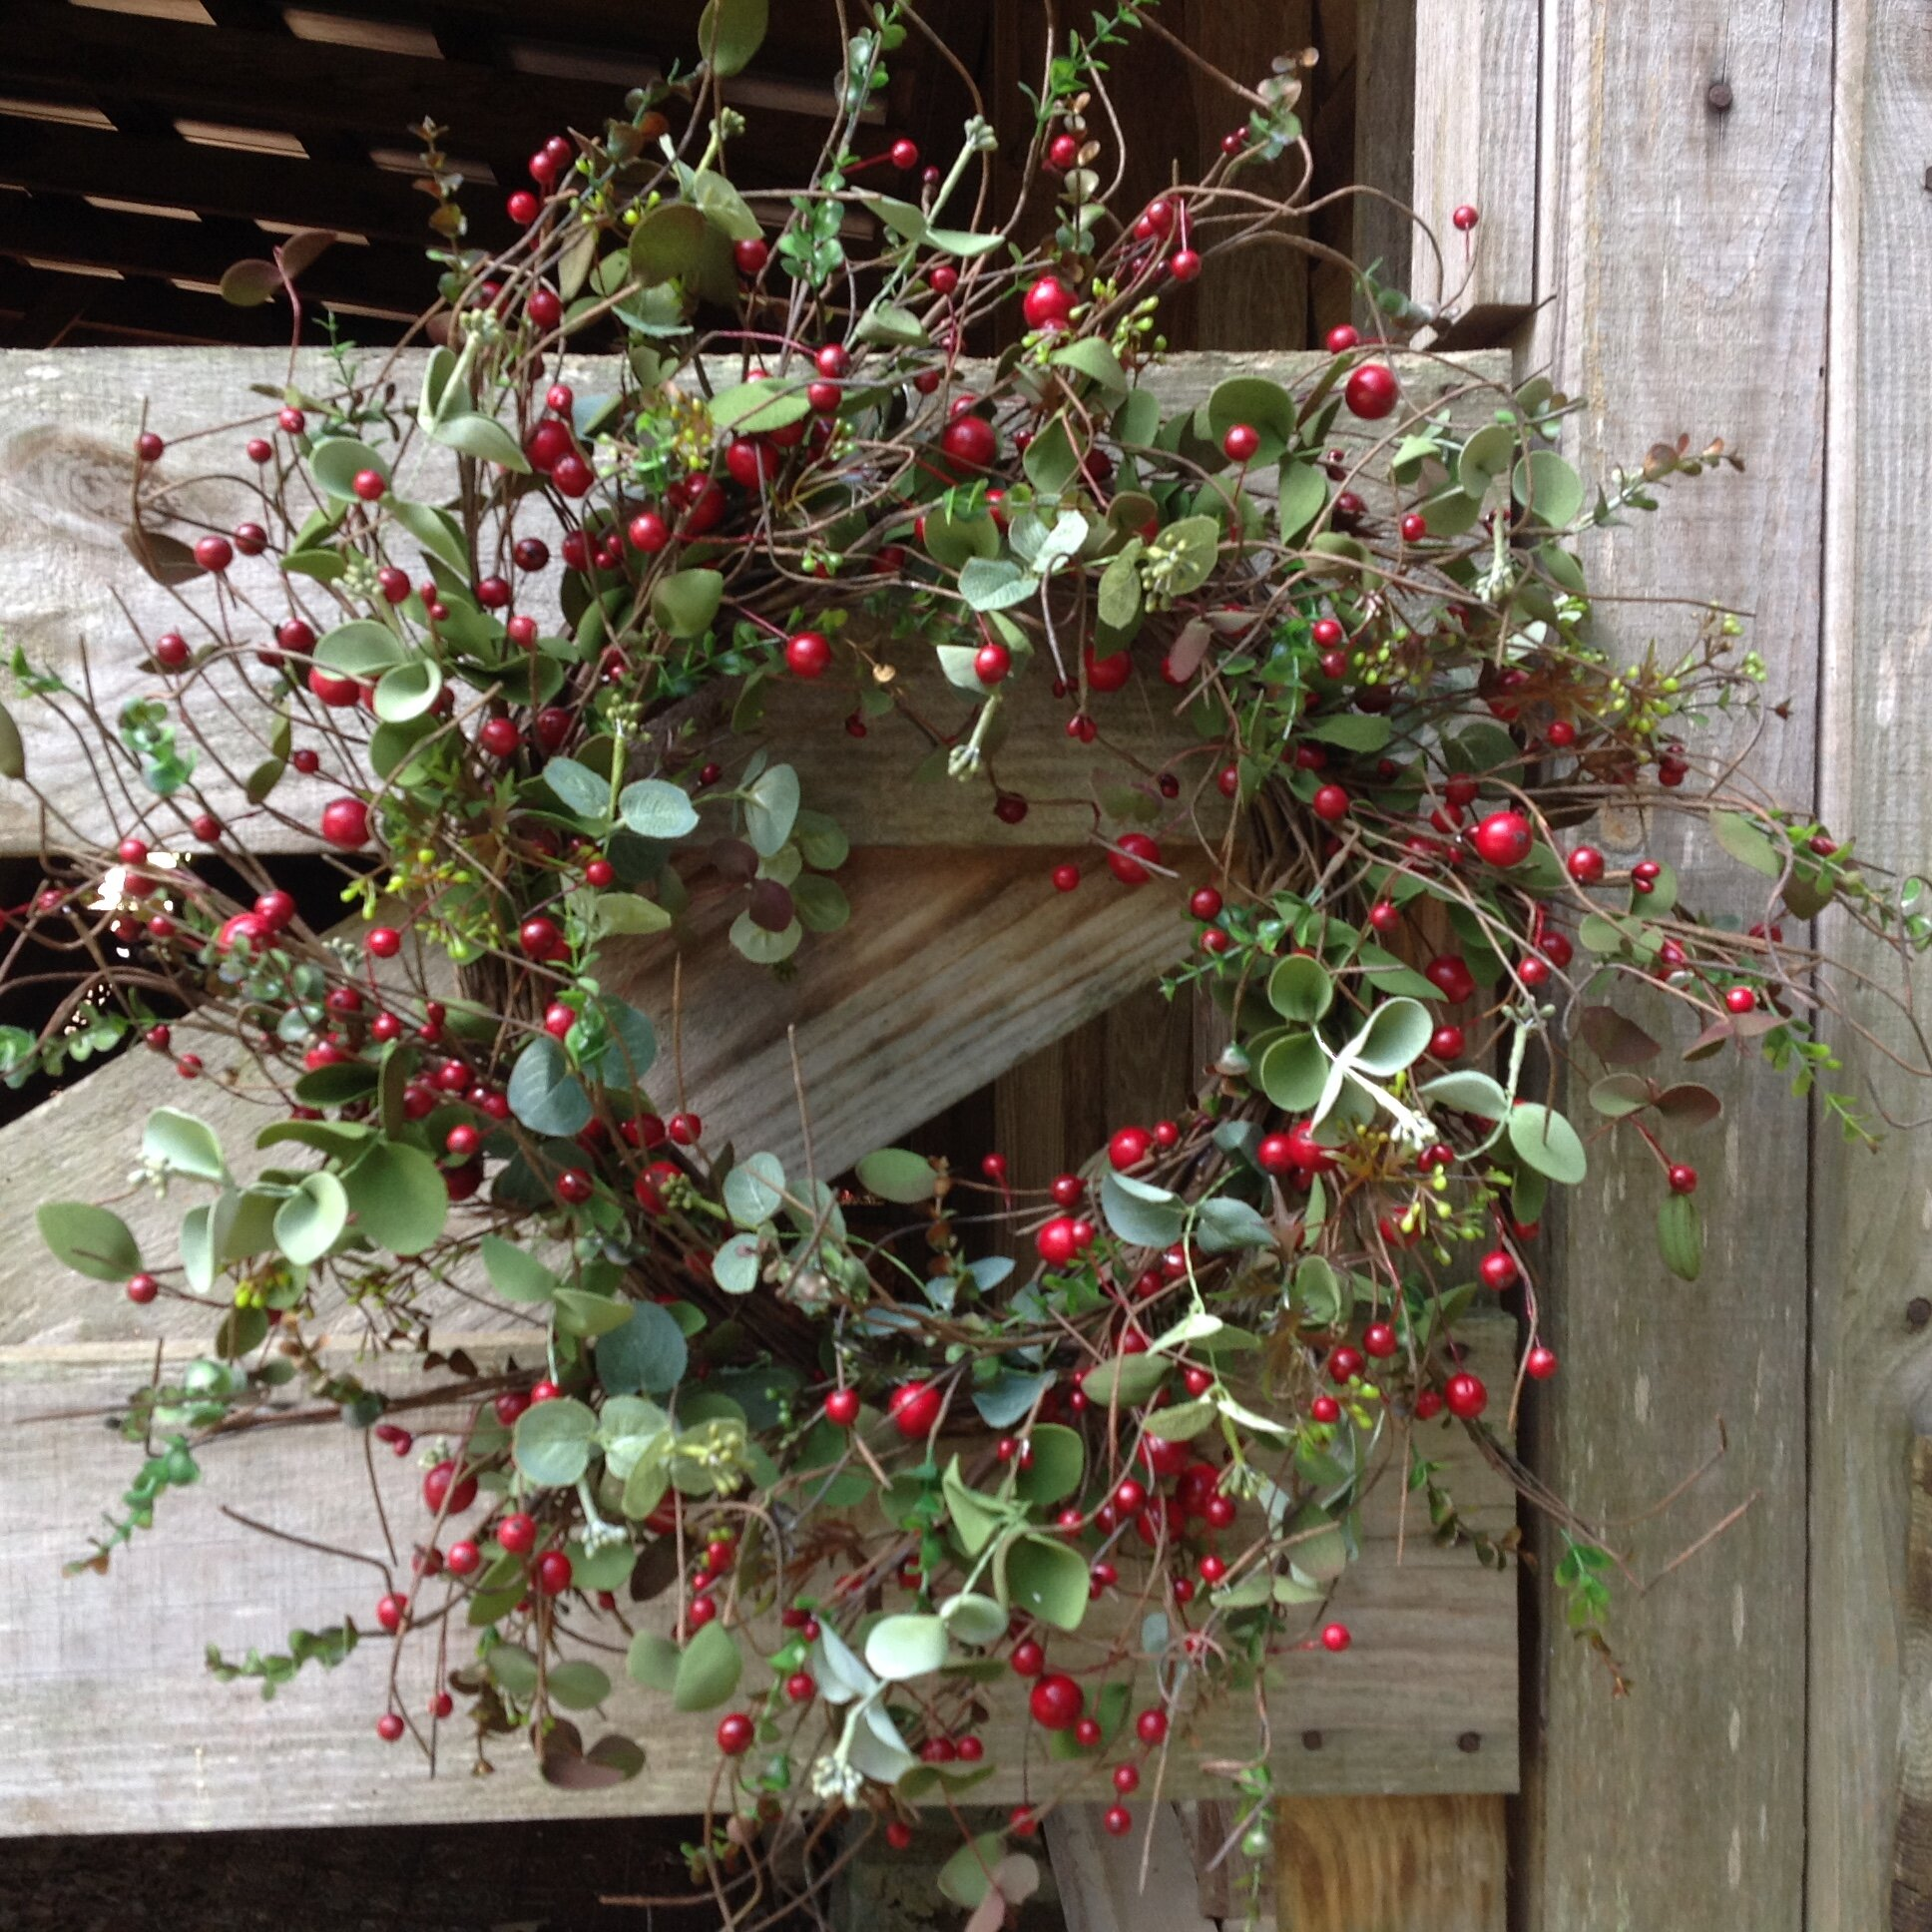 Outdoor Christmas Wreaths You Ll Love In 2021 Wayfair